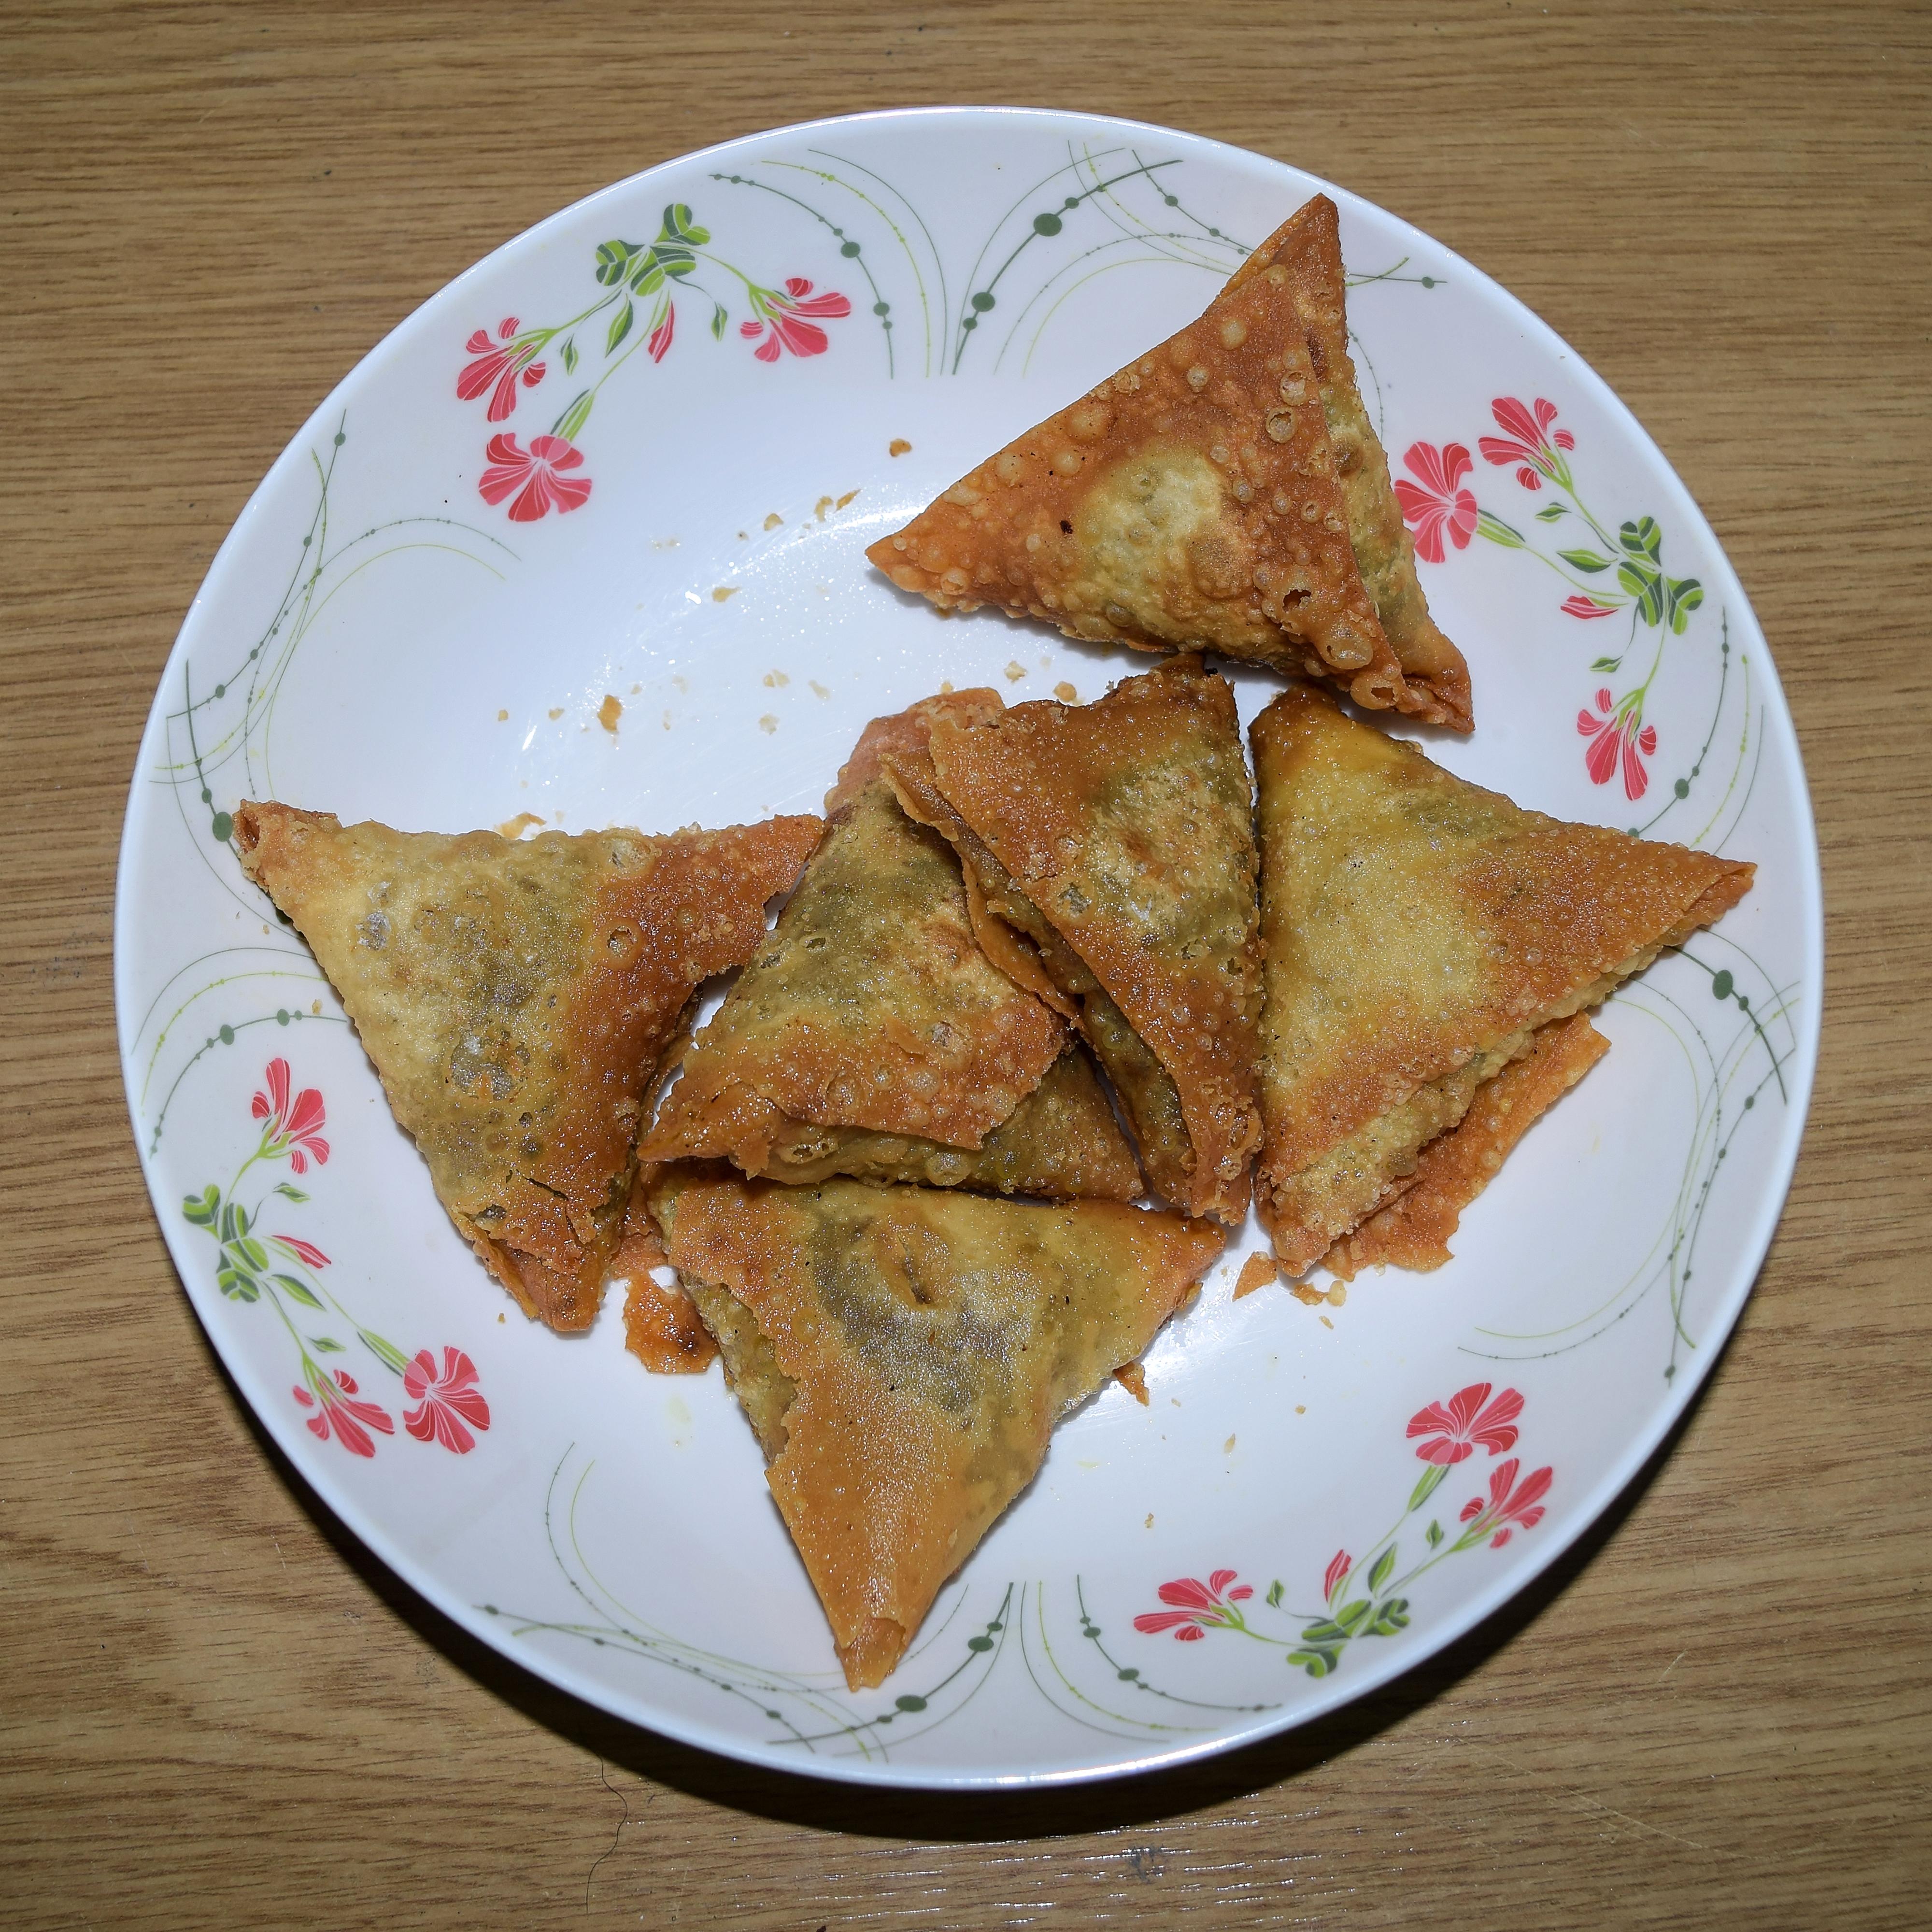 Samosa wikipedia bangladeshi samosas snack food forumfinder Gallery